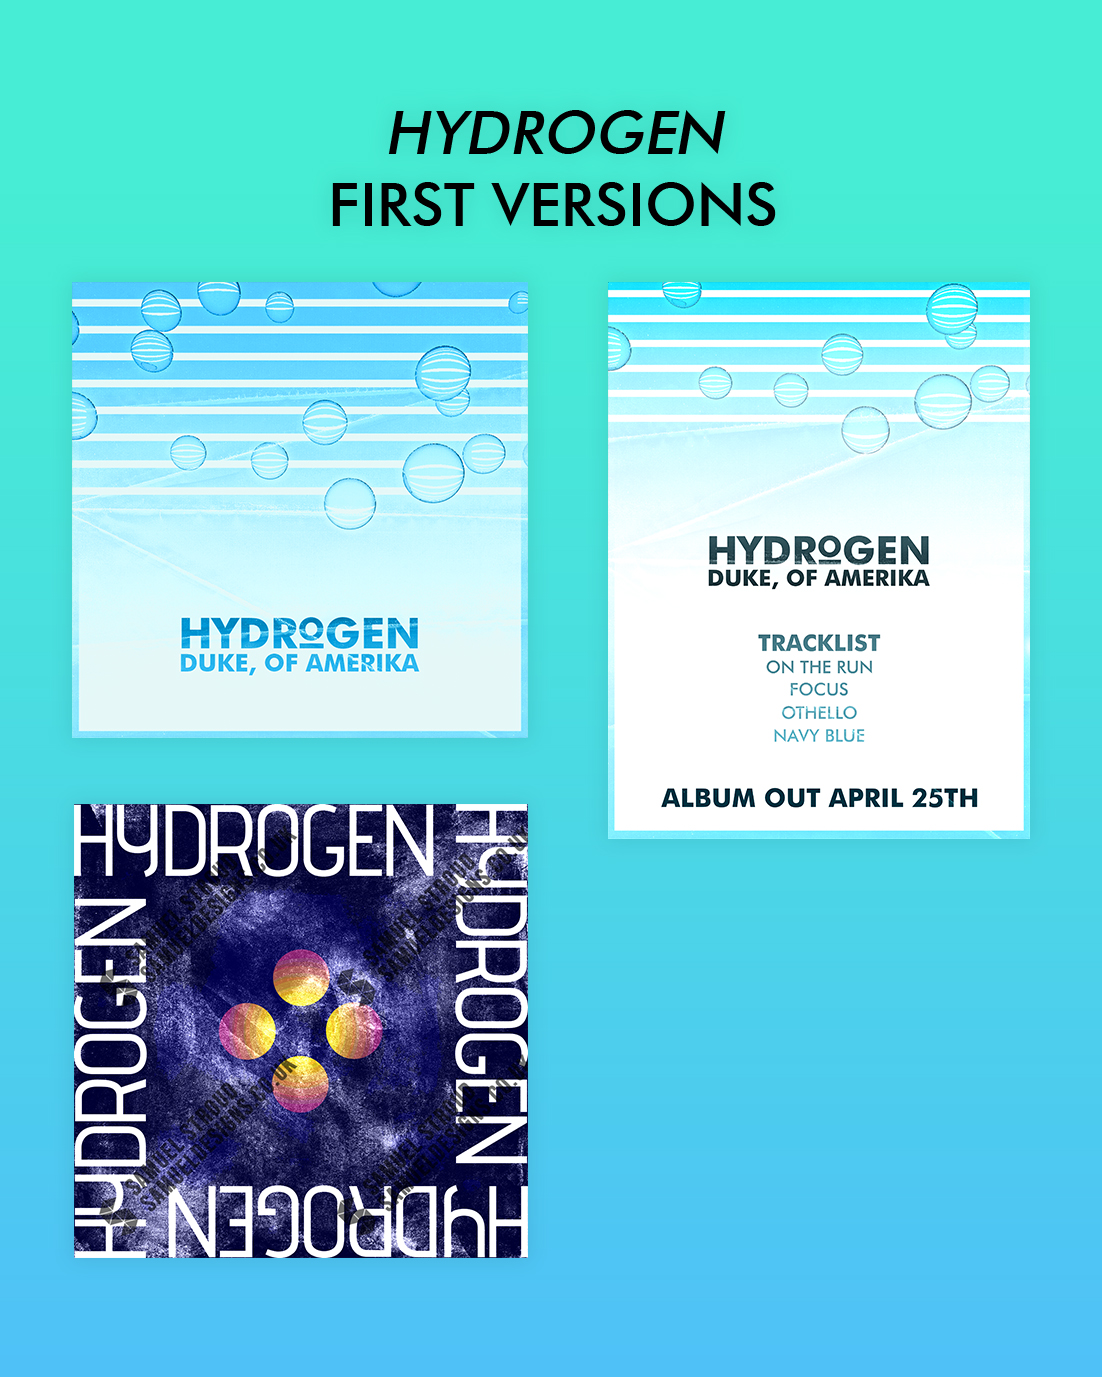 Hydrogen First Versions 2.jpg